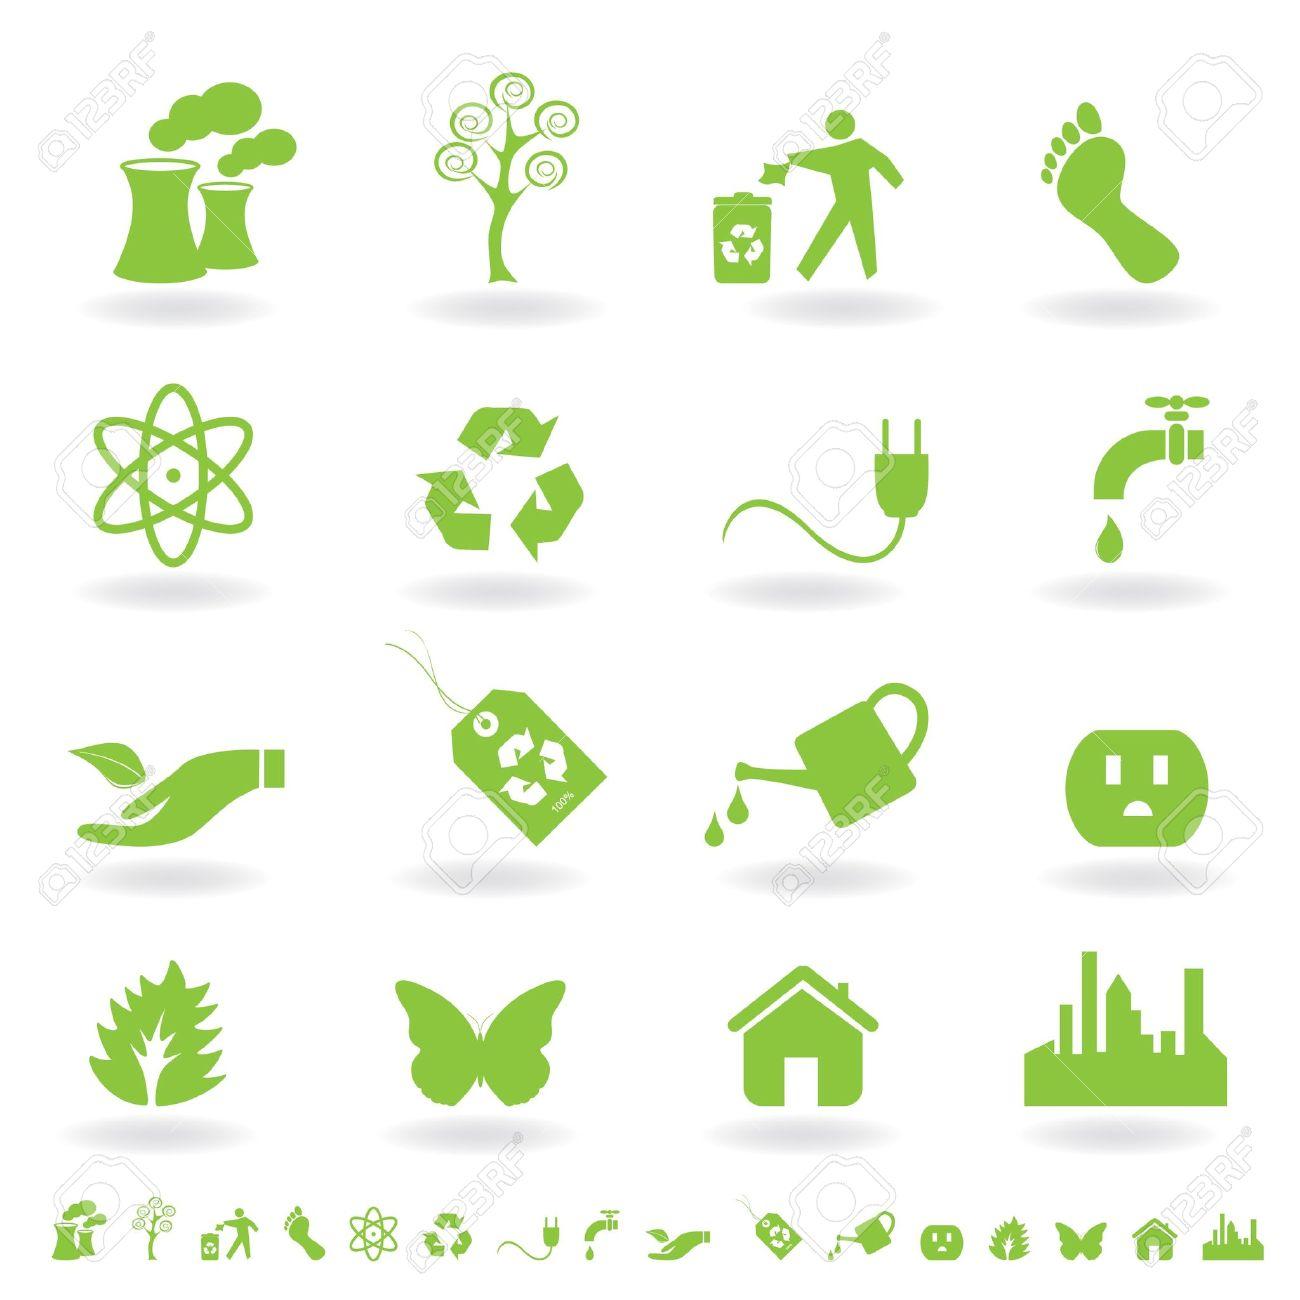 Eco friendly icon set in green Stock Photo - 7717468